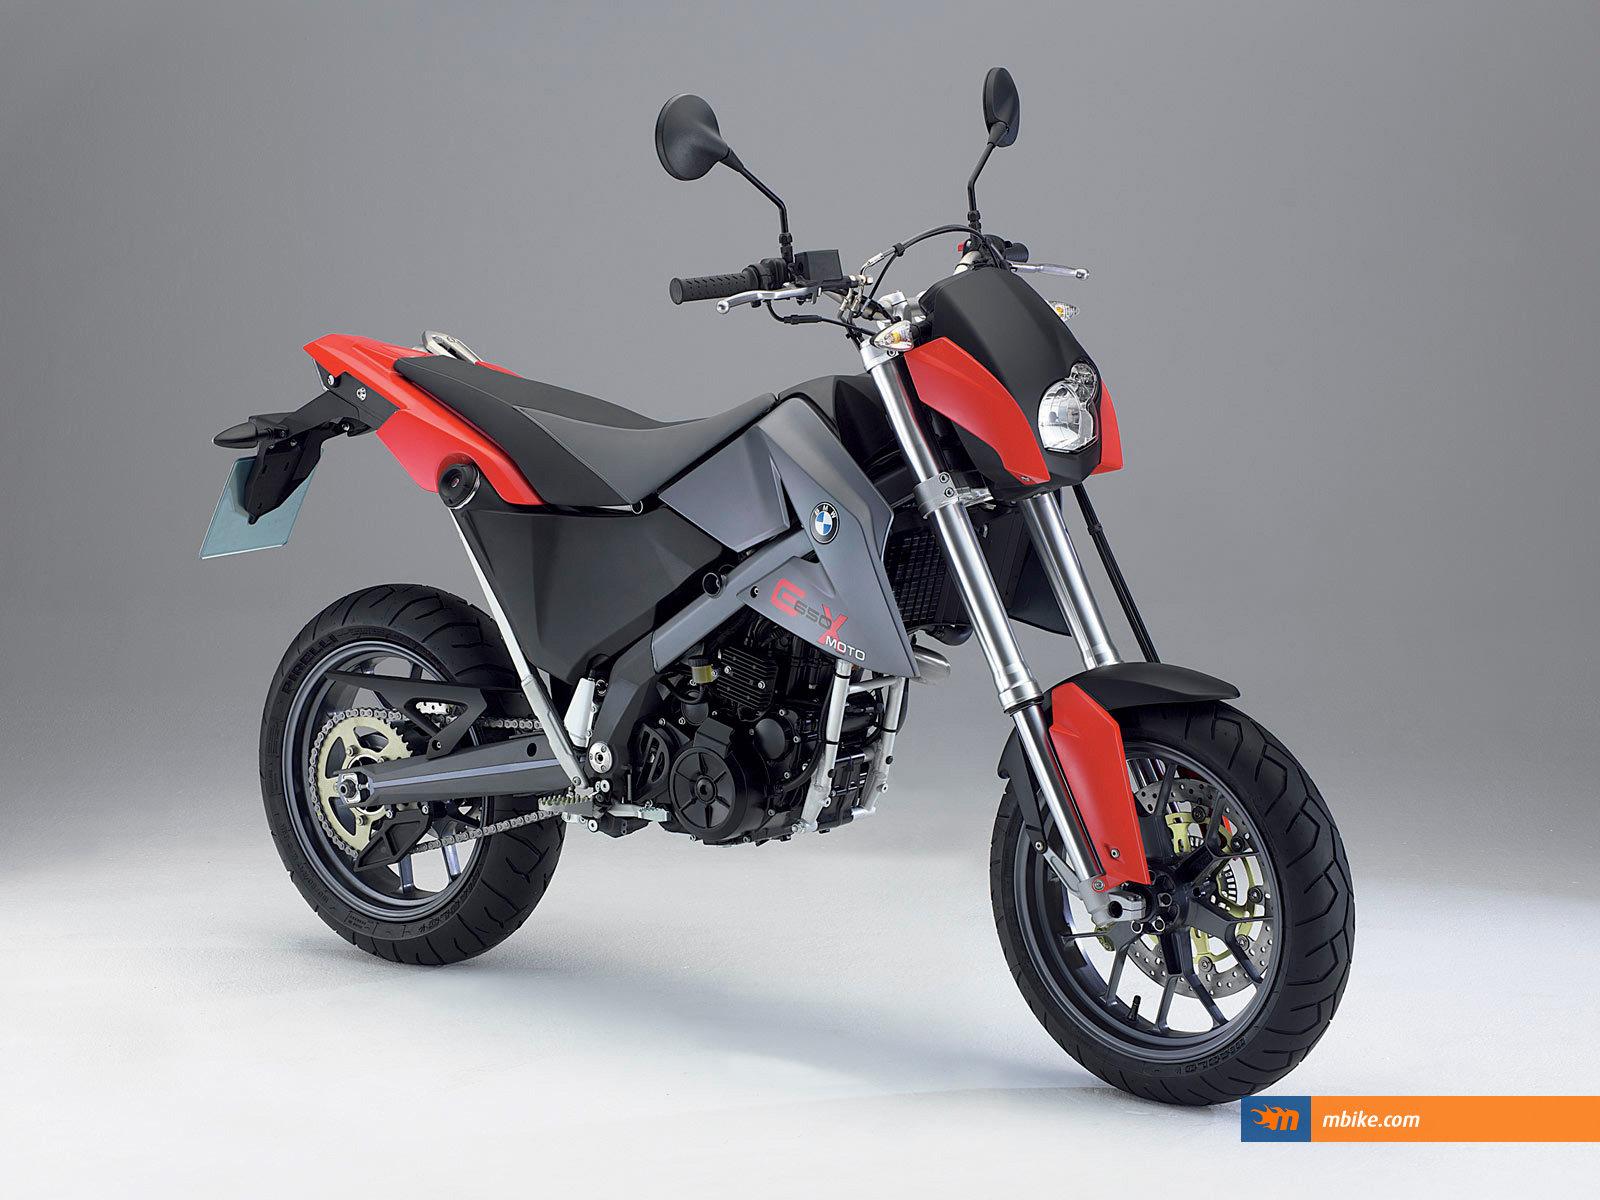 2007 Bmw G650 Xmoto Wallpaper Mbike Com